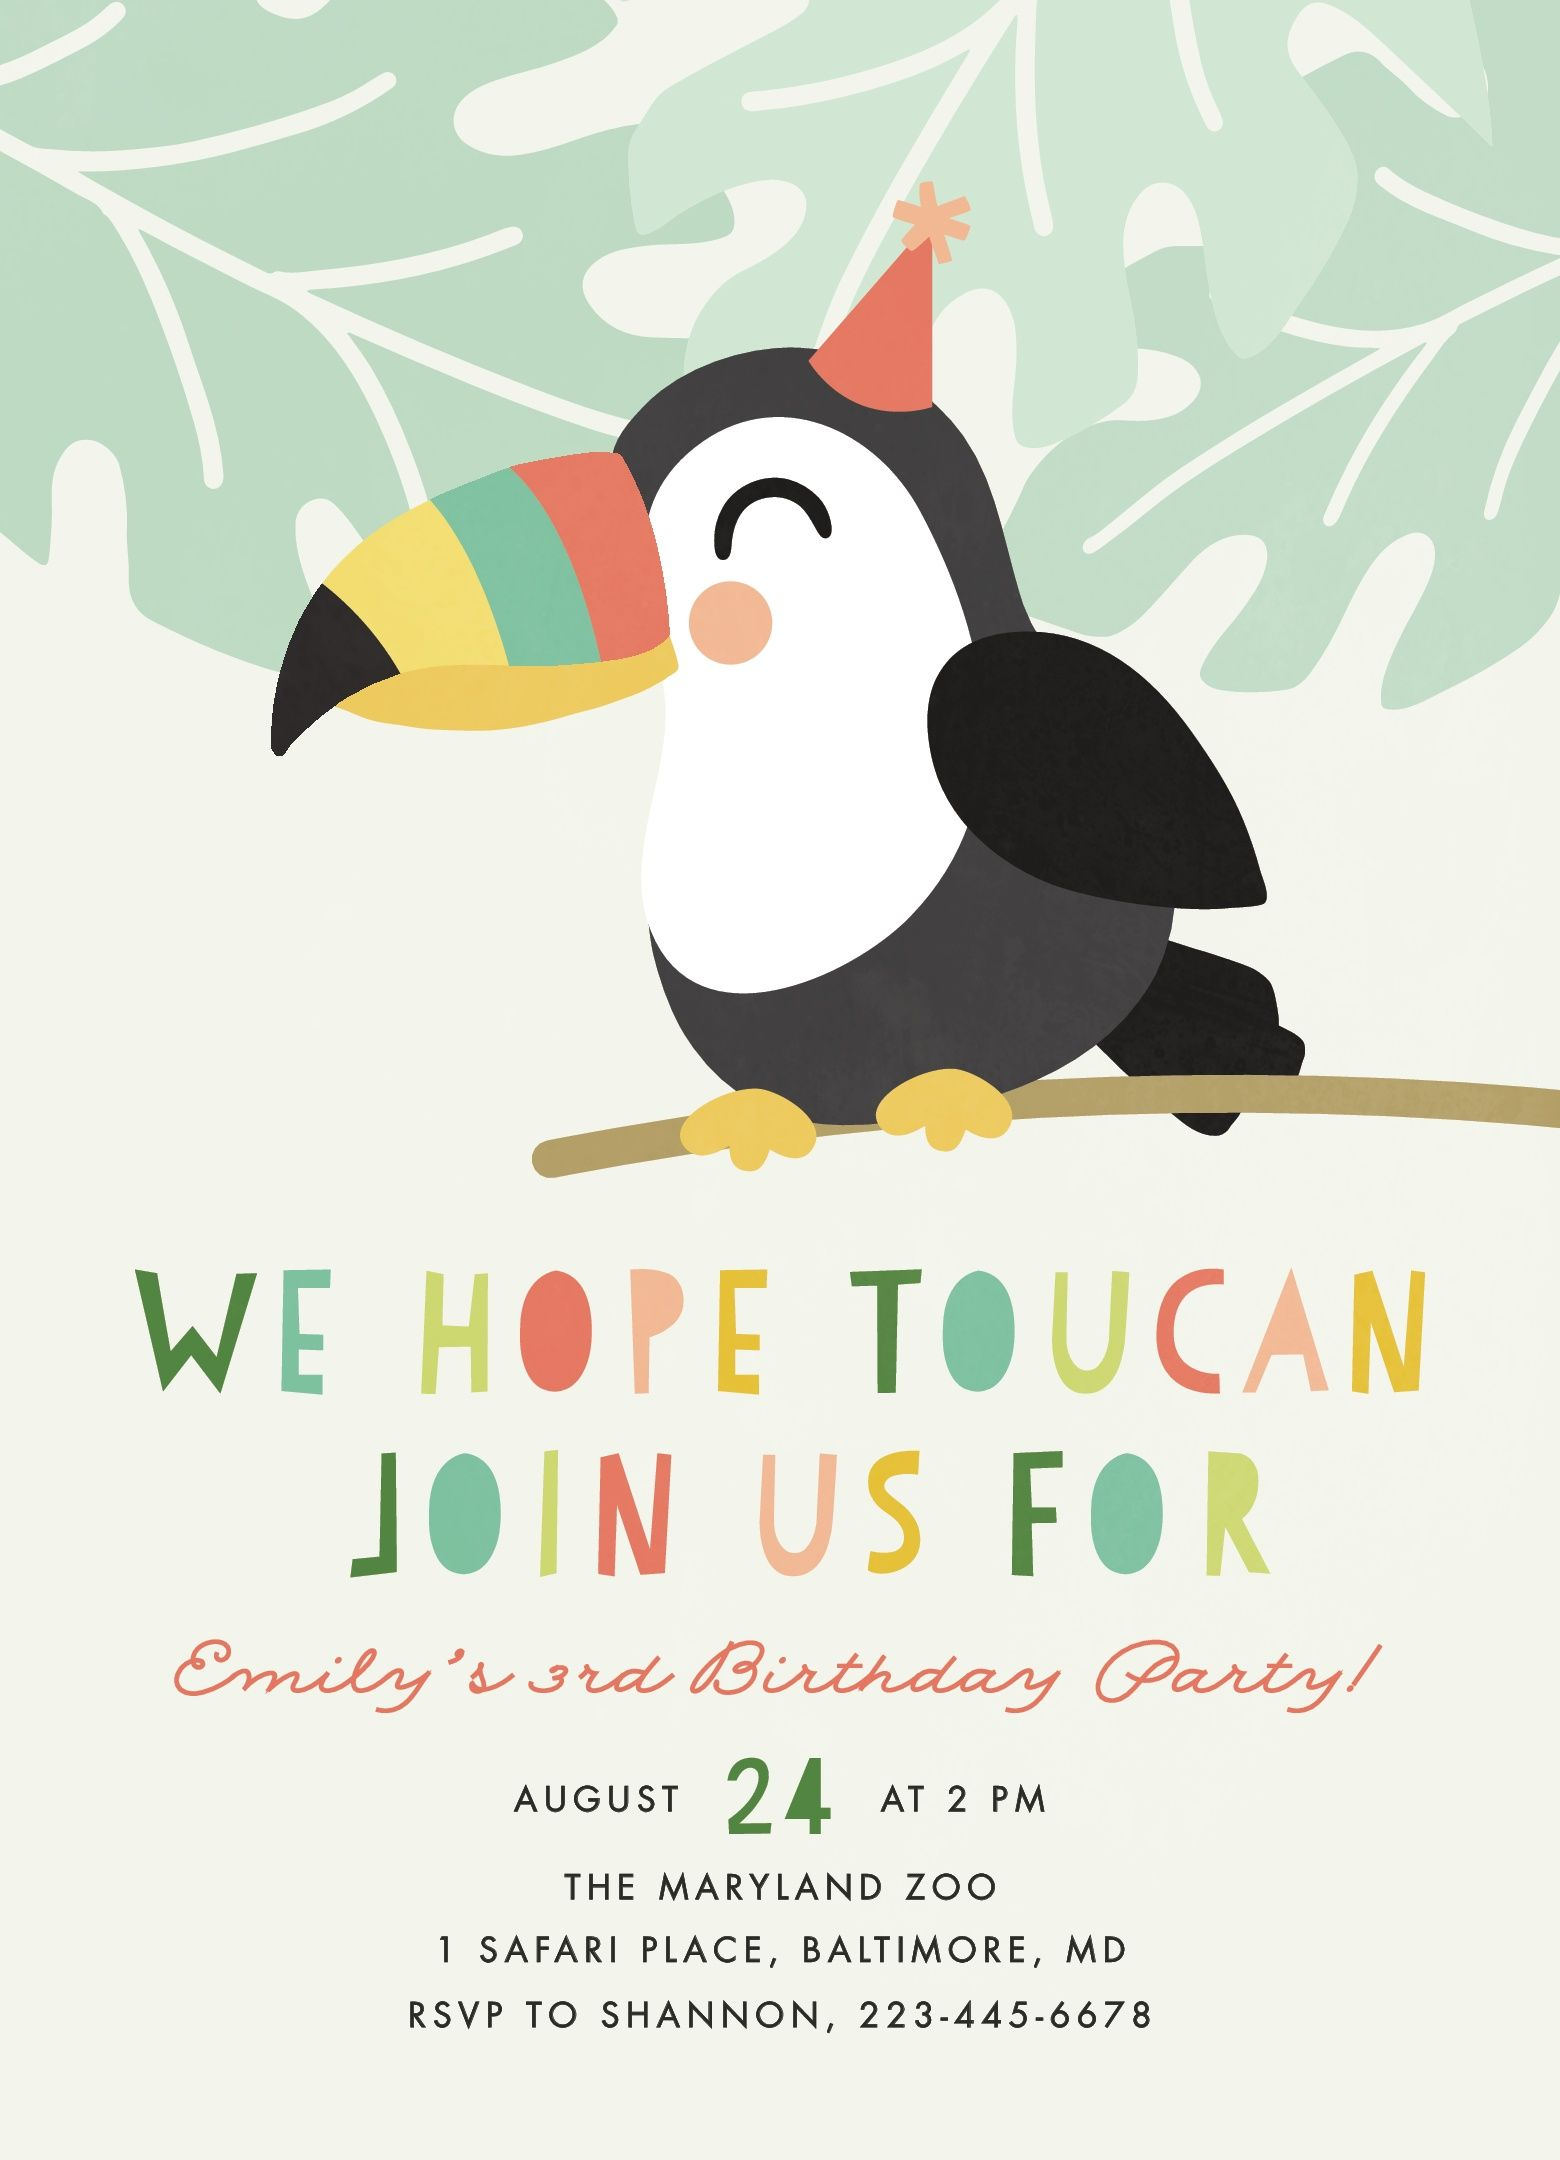 Toucan Children's Birthday Party Invitations #tropicalbirthdayparty